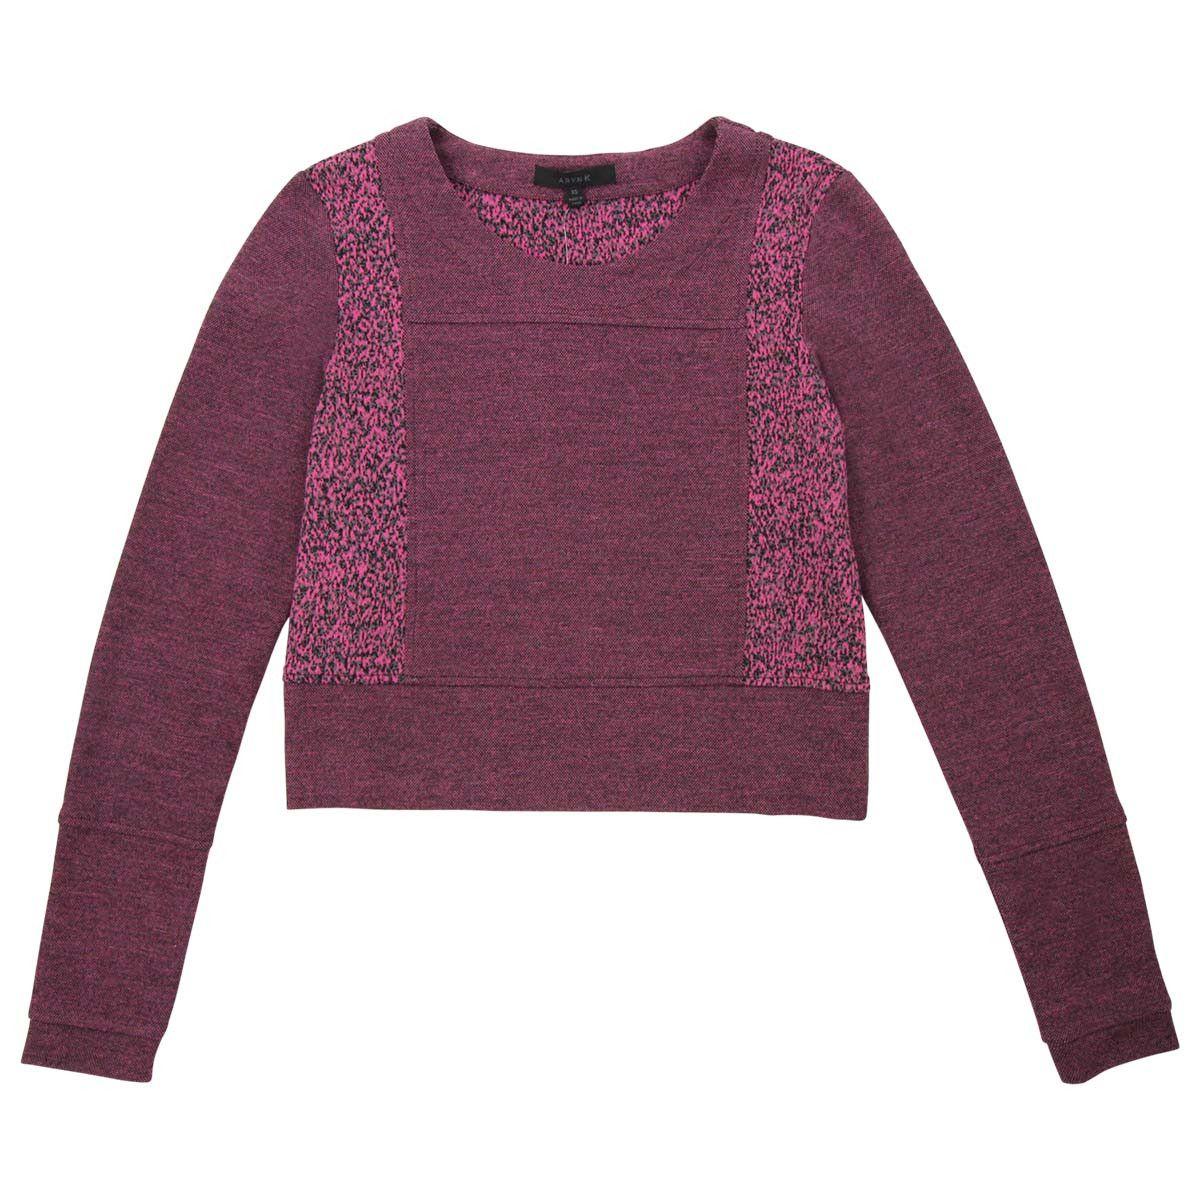 "Long Sleeve ""Mom Crop"" Sweater"